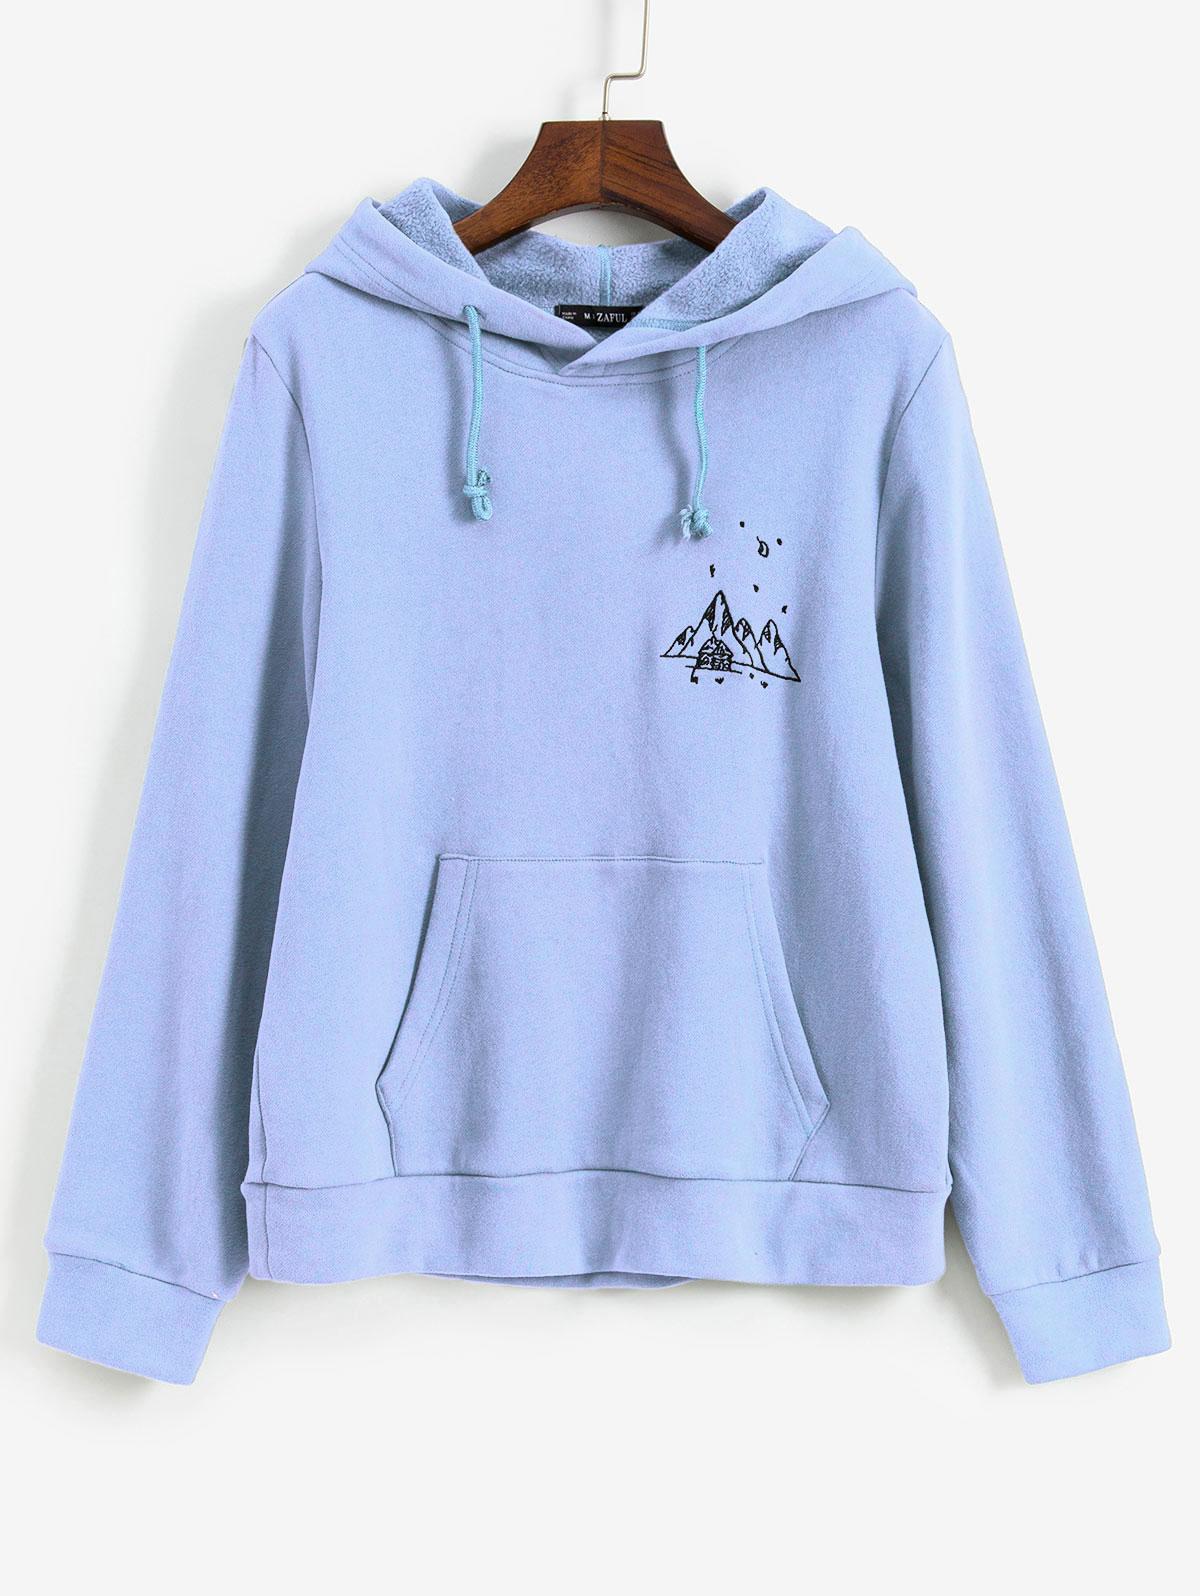 ZAFUL Embroidered Fleece Lined Kangaroo Pocket Hoodie, Day sky blue